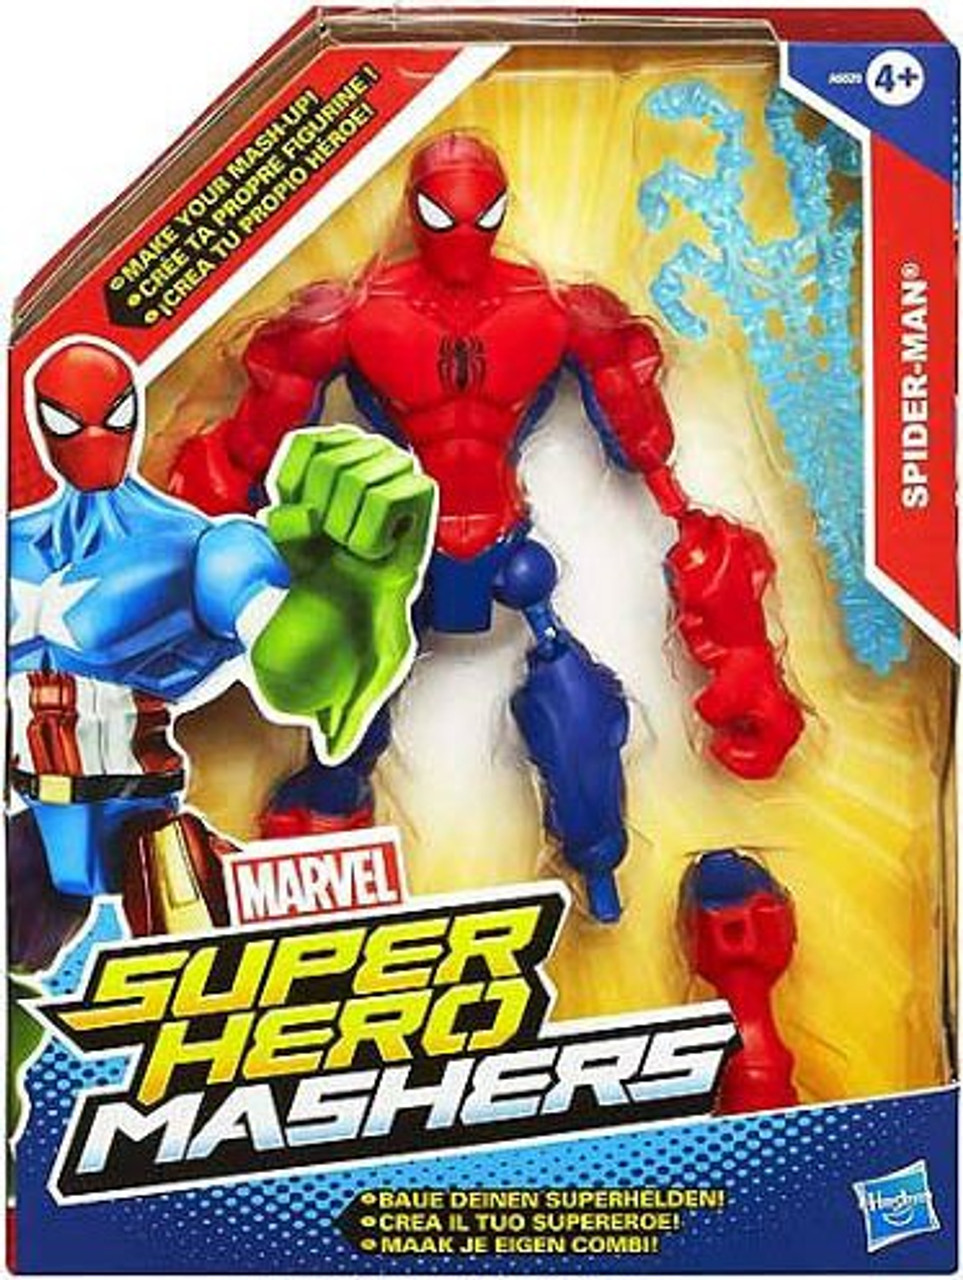 Marvel Super Hero Mashers Spider-Man Action Figure